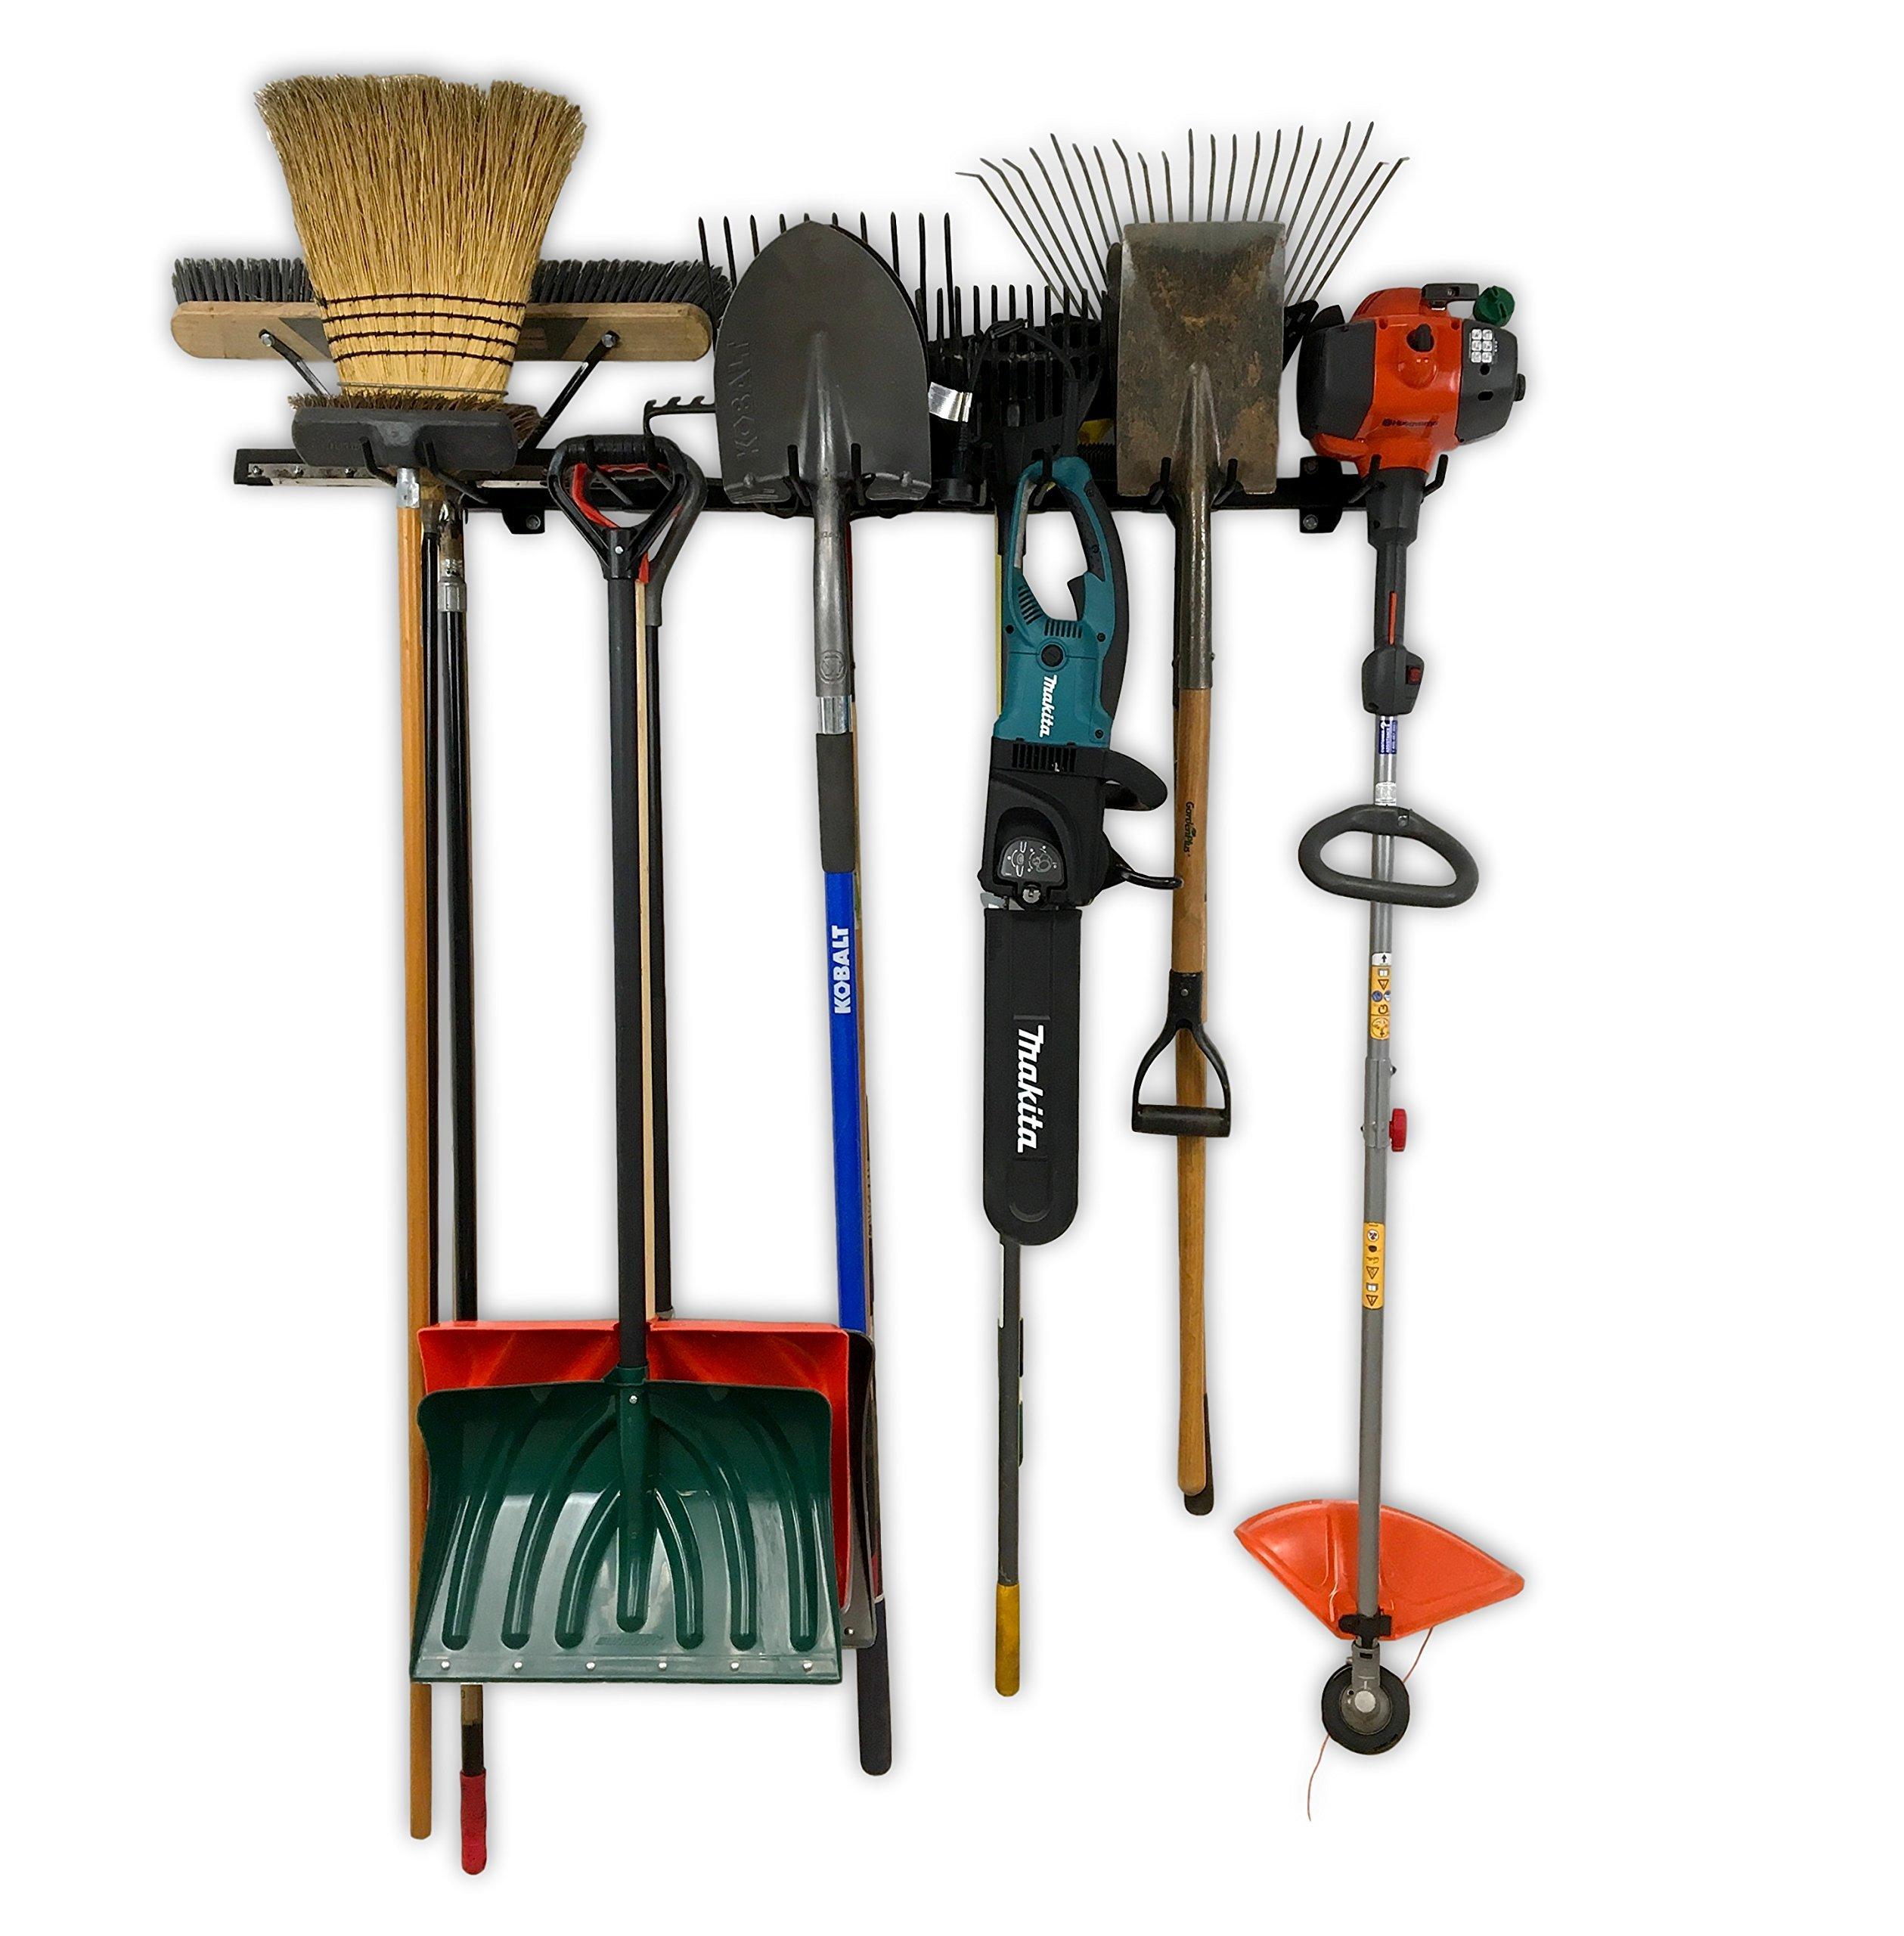 Omni Tool Storage Rack   Max | Wall Mount Tools Home U0026 Garage Storage  System | Steel Gear Hanger